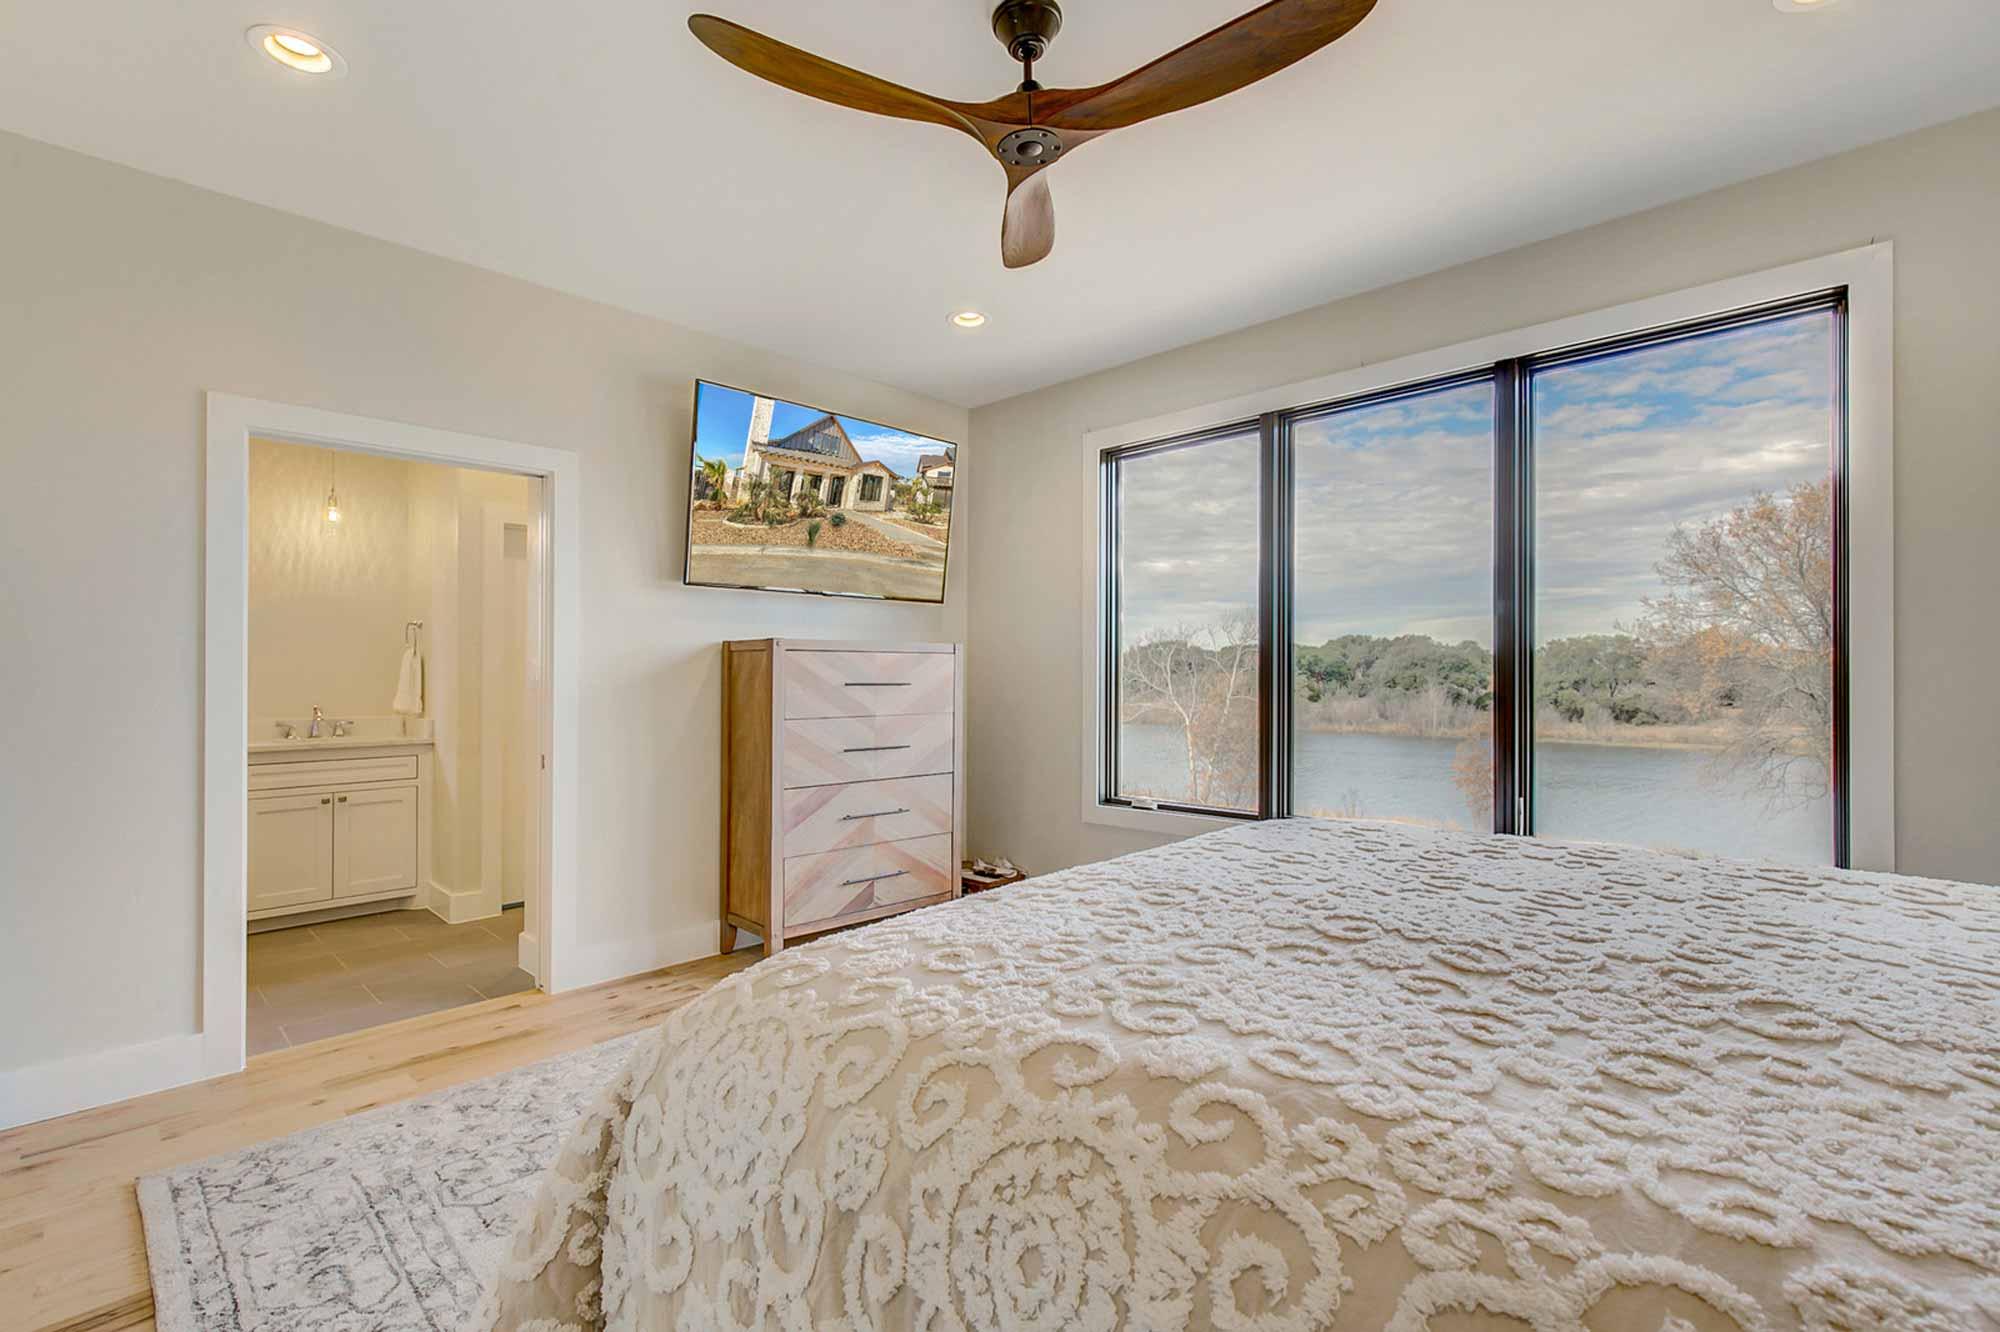 Steve-Bumpas-Custom-Homes-The-Residences-at-Rough-Creek-Lodge-The-Lynn-Lot-15-12-Fort-Worth-Vacation-Properties.jpg